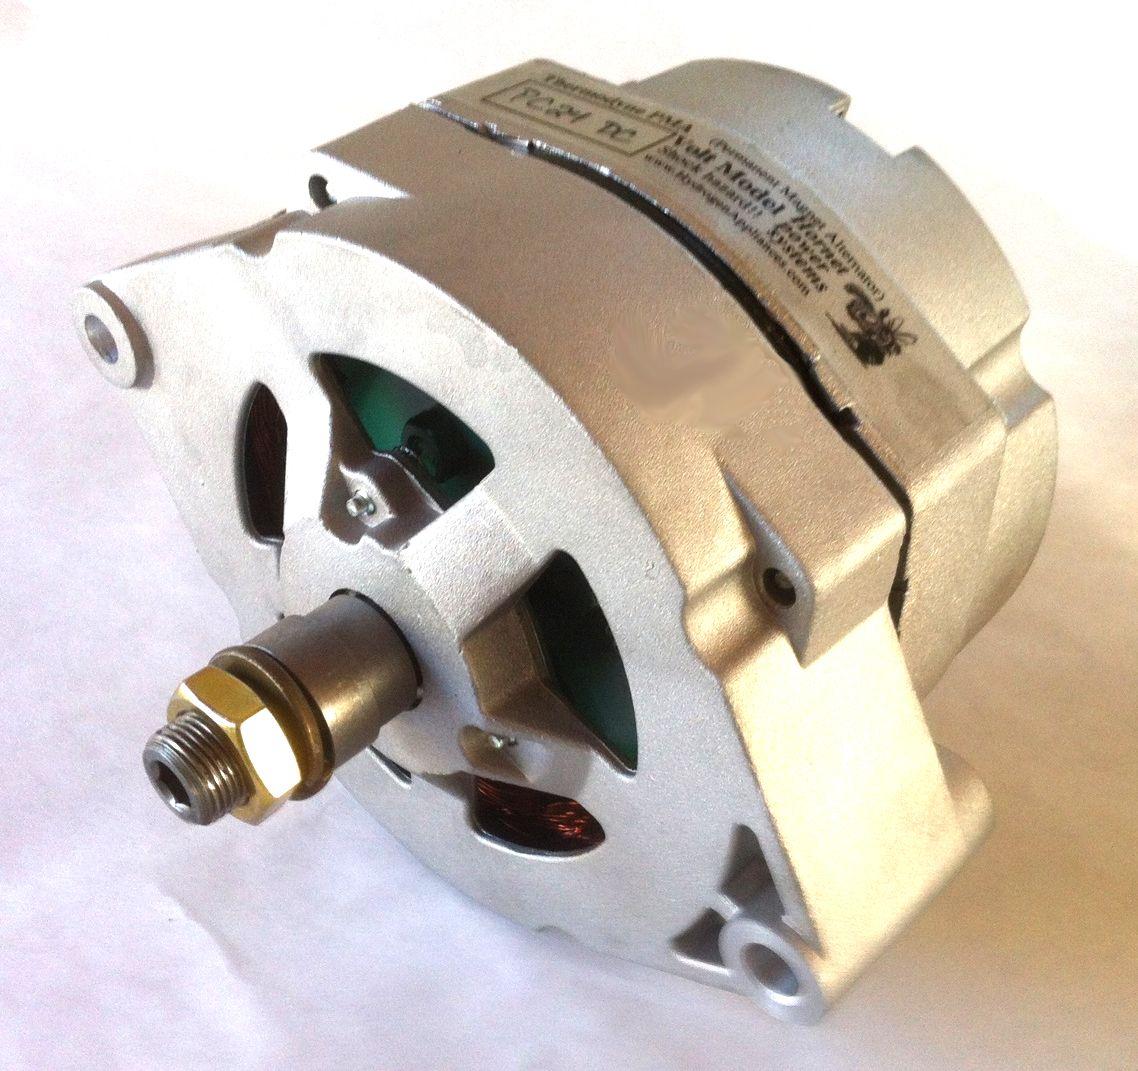 10 Hp Permanent Magnet Motor Generator Pmg Manta Ideas Project Dc 8 Electric 5 Controller Dual Bicycle Gokarts Kart